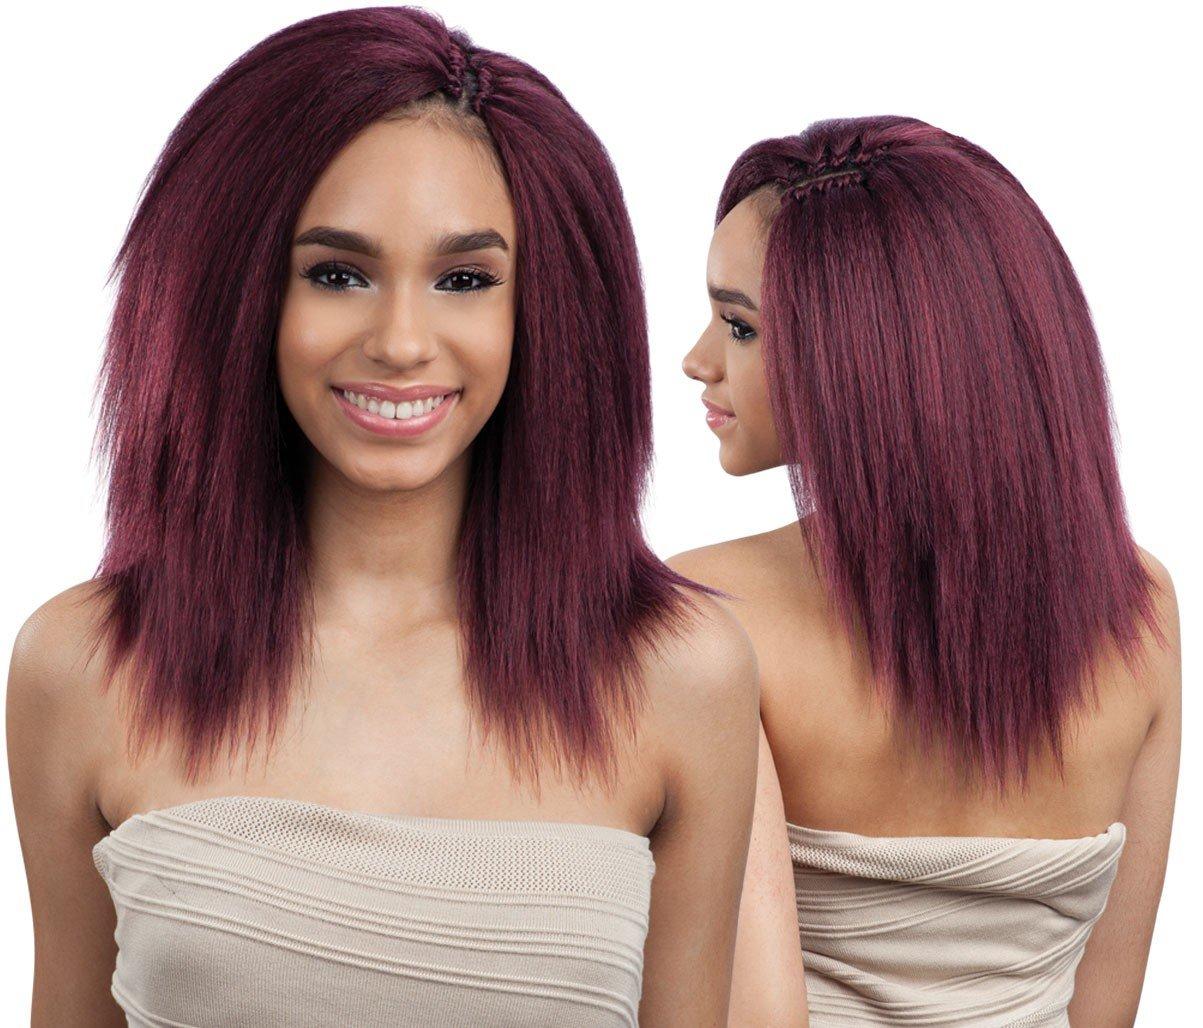 Amazon.com : FreeTress Synthetic Hair Crochet Braids 3X ... - photo #19